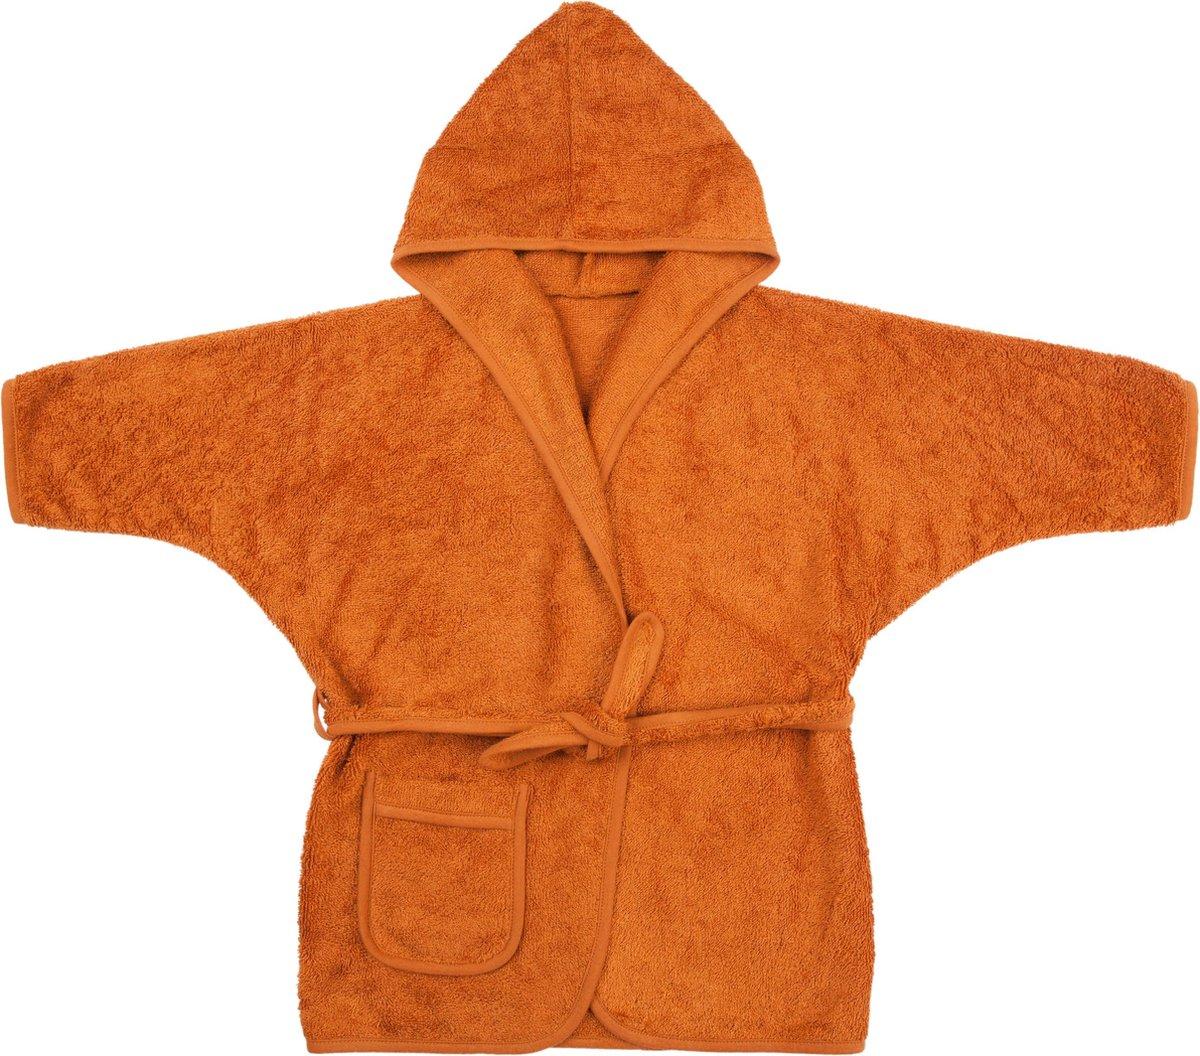 Timboo Badjas kind Inca Rust 8/10 jaar - Bamboe - Extra zacht - Kinderbadjas - Roest